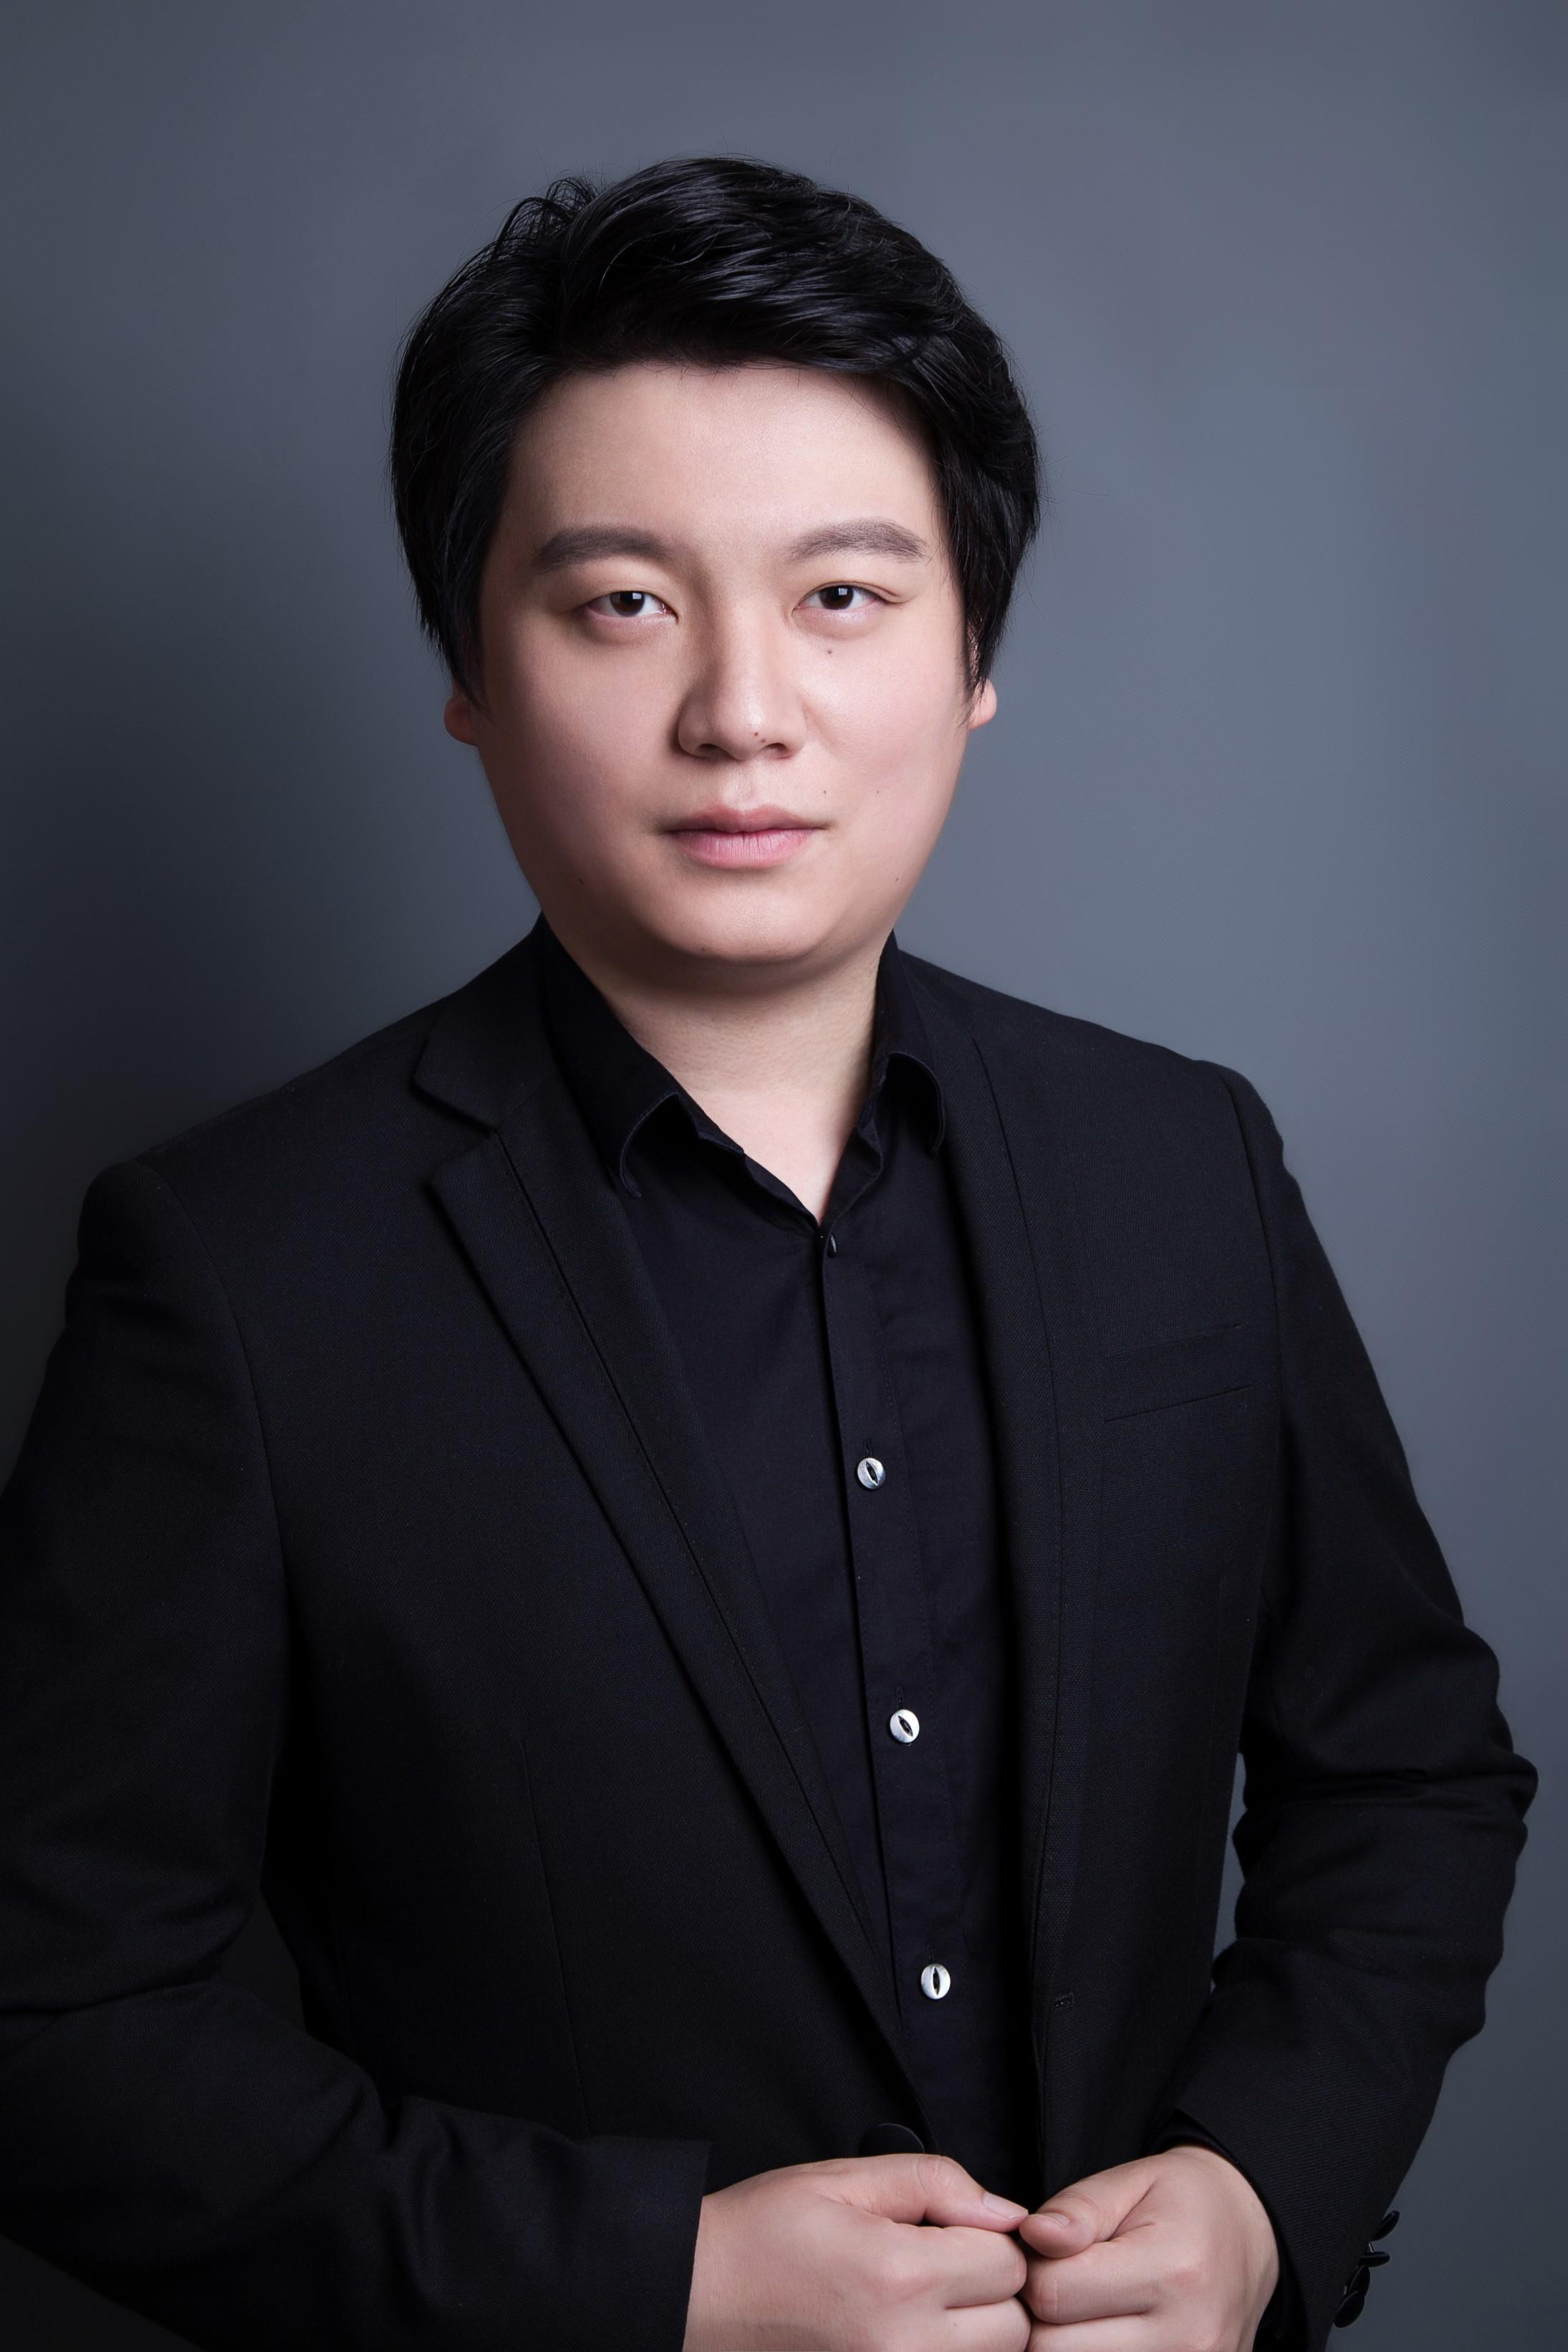 Yongxi_Chen_-_Headshot (2).jpg